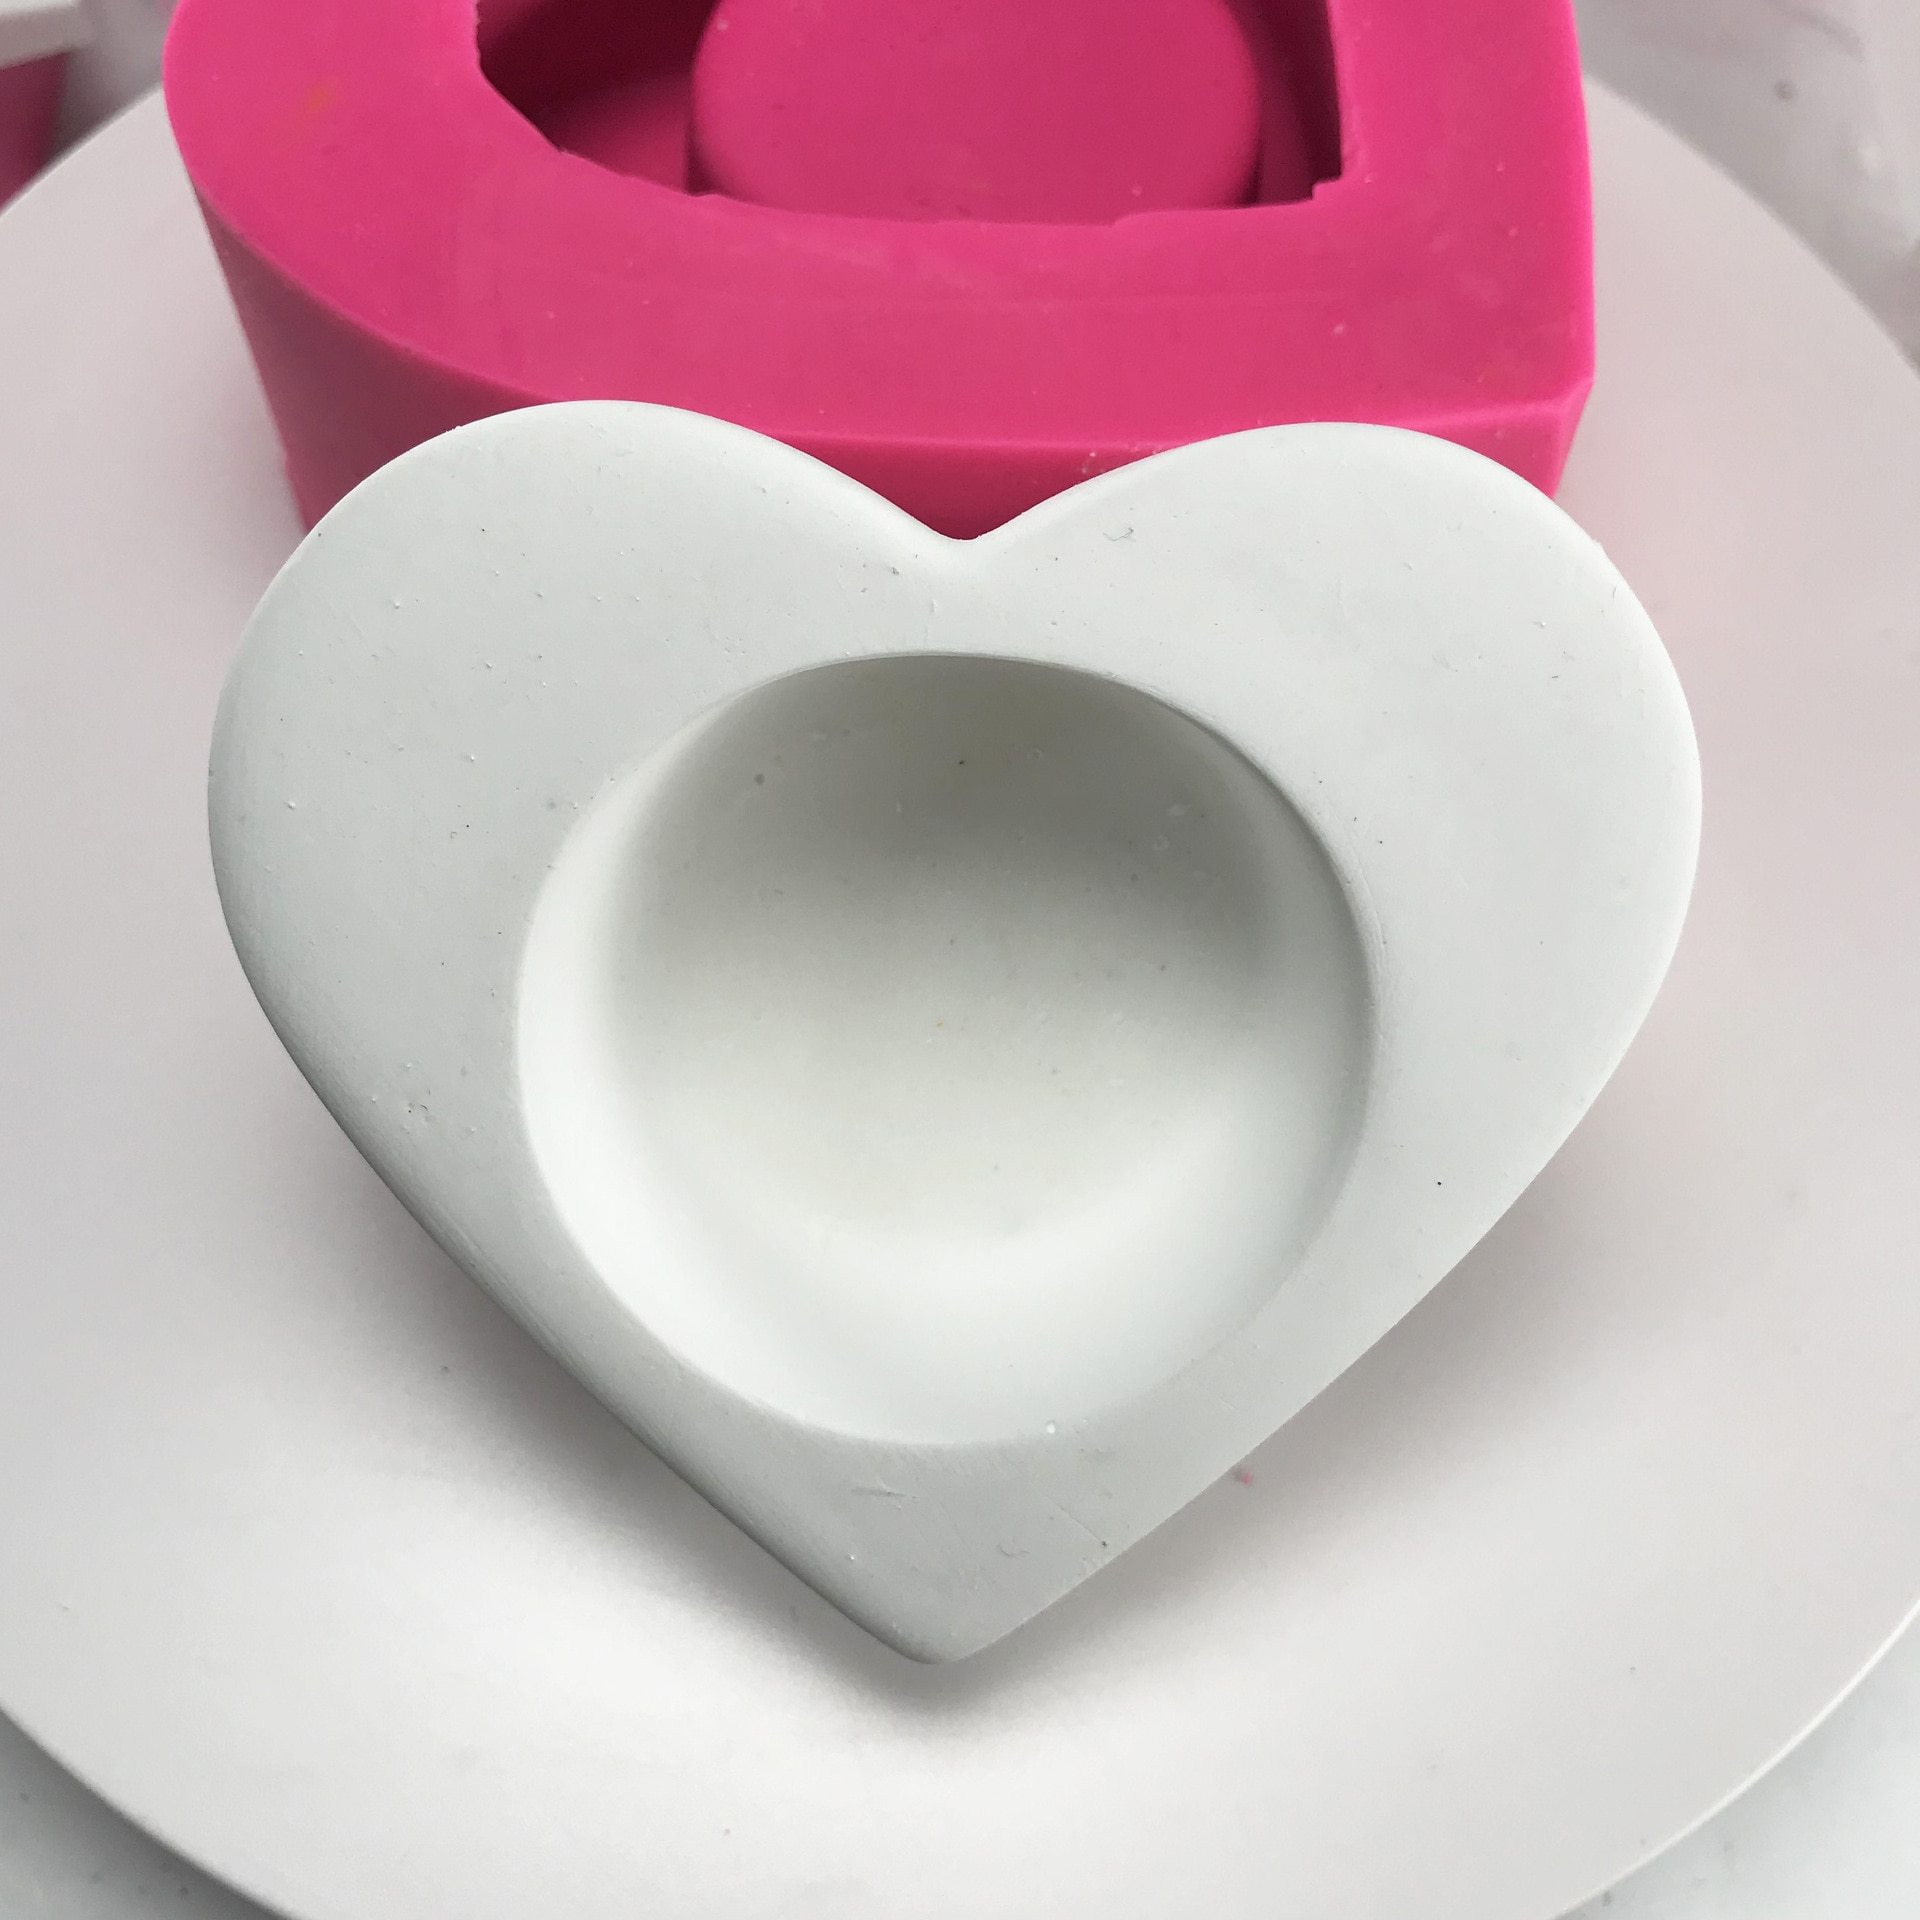 Mini maceta en forma de corazón 3D que hace moldes de silicona de candelabro para macetas de cemento hechos a mano